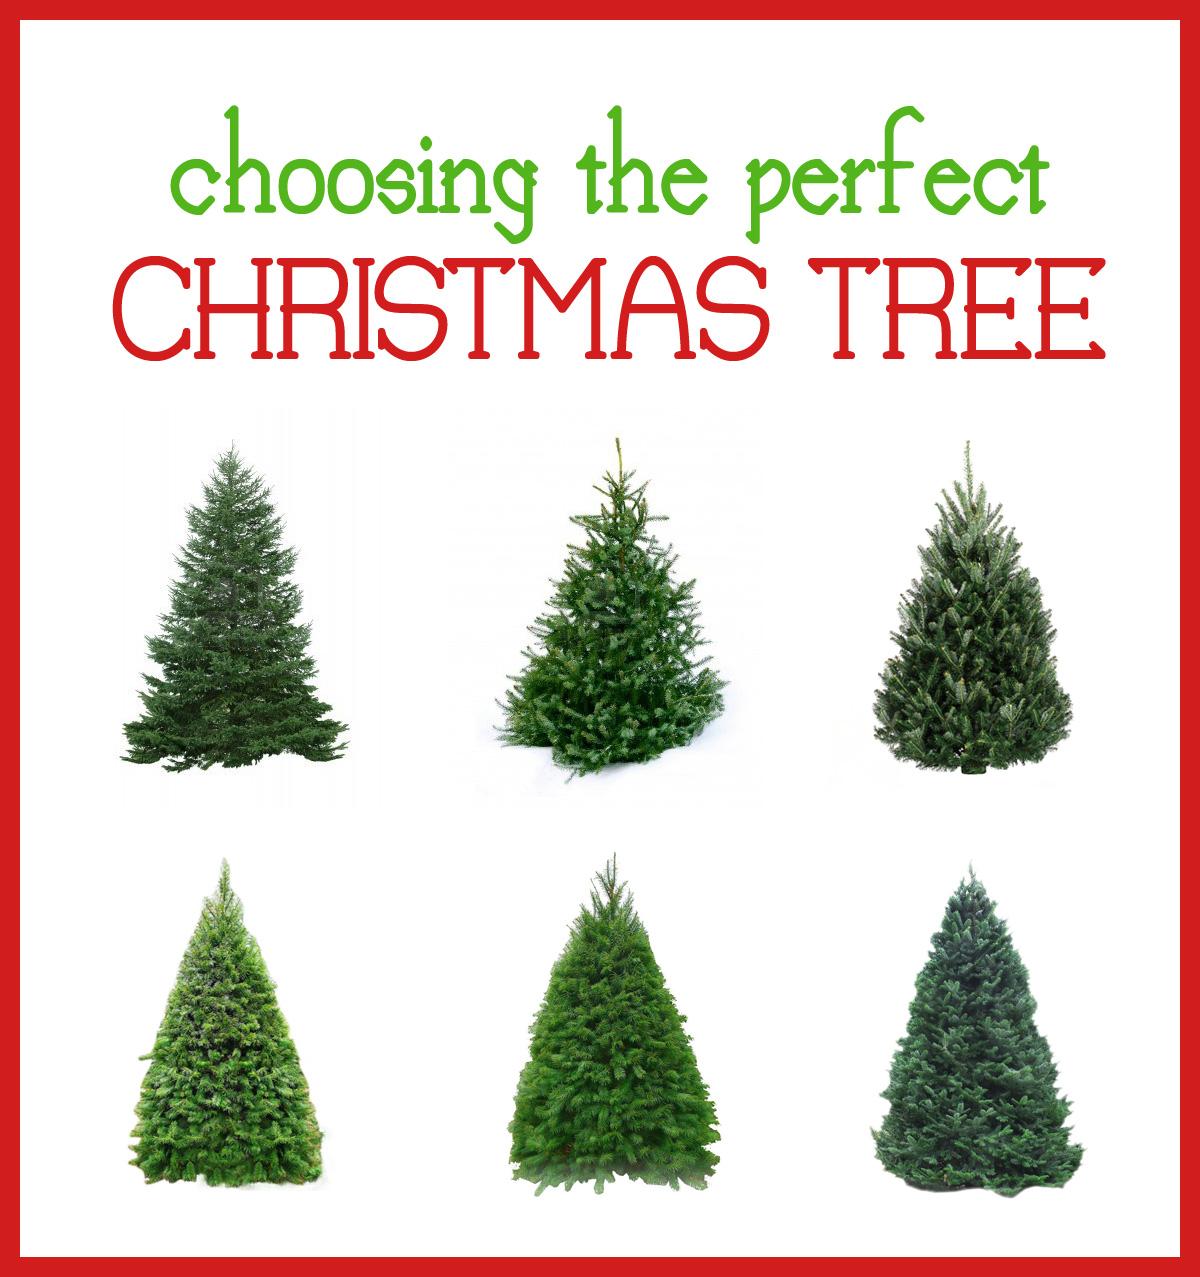 Types Of Christmas Trees Kccbtafb